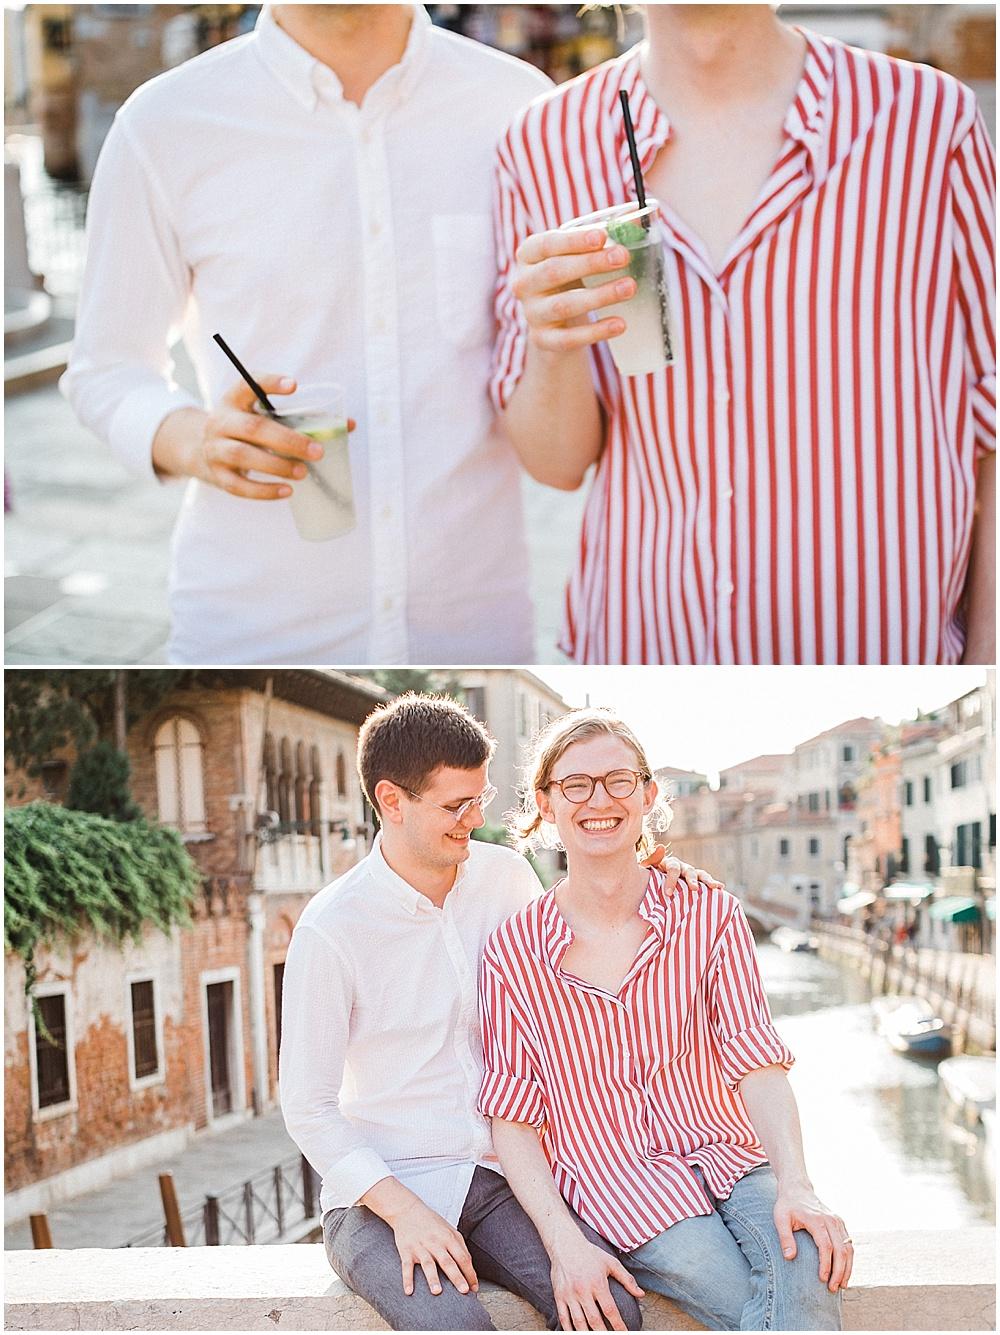 same-sex-wedding-photographer-venice-stefano-degirmenci_0003.jpg